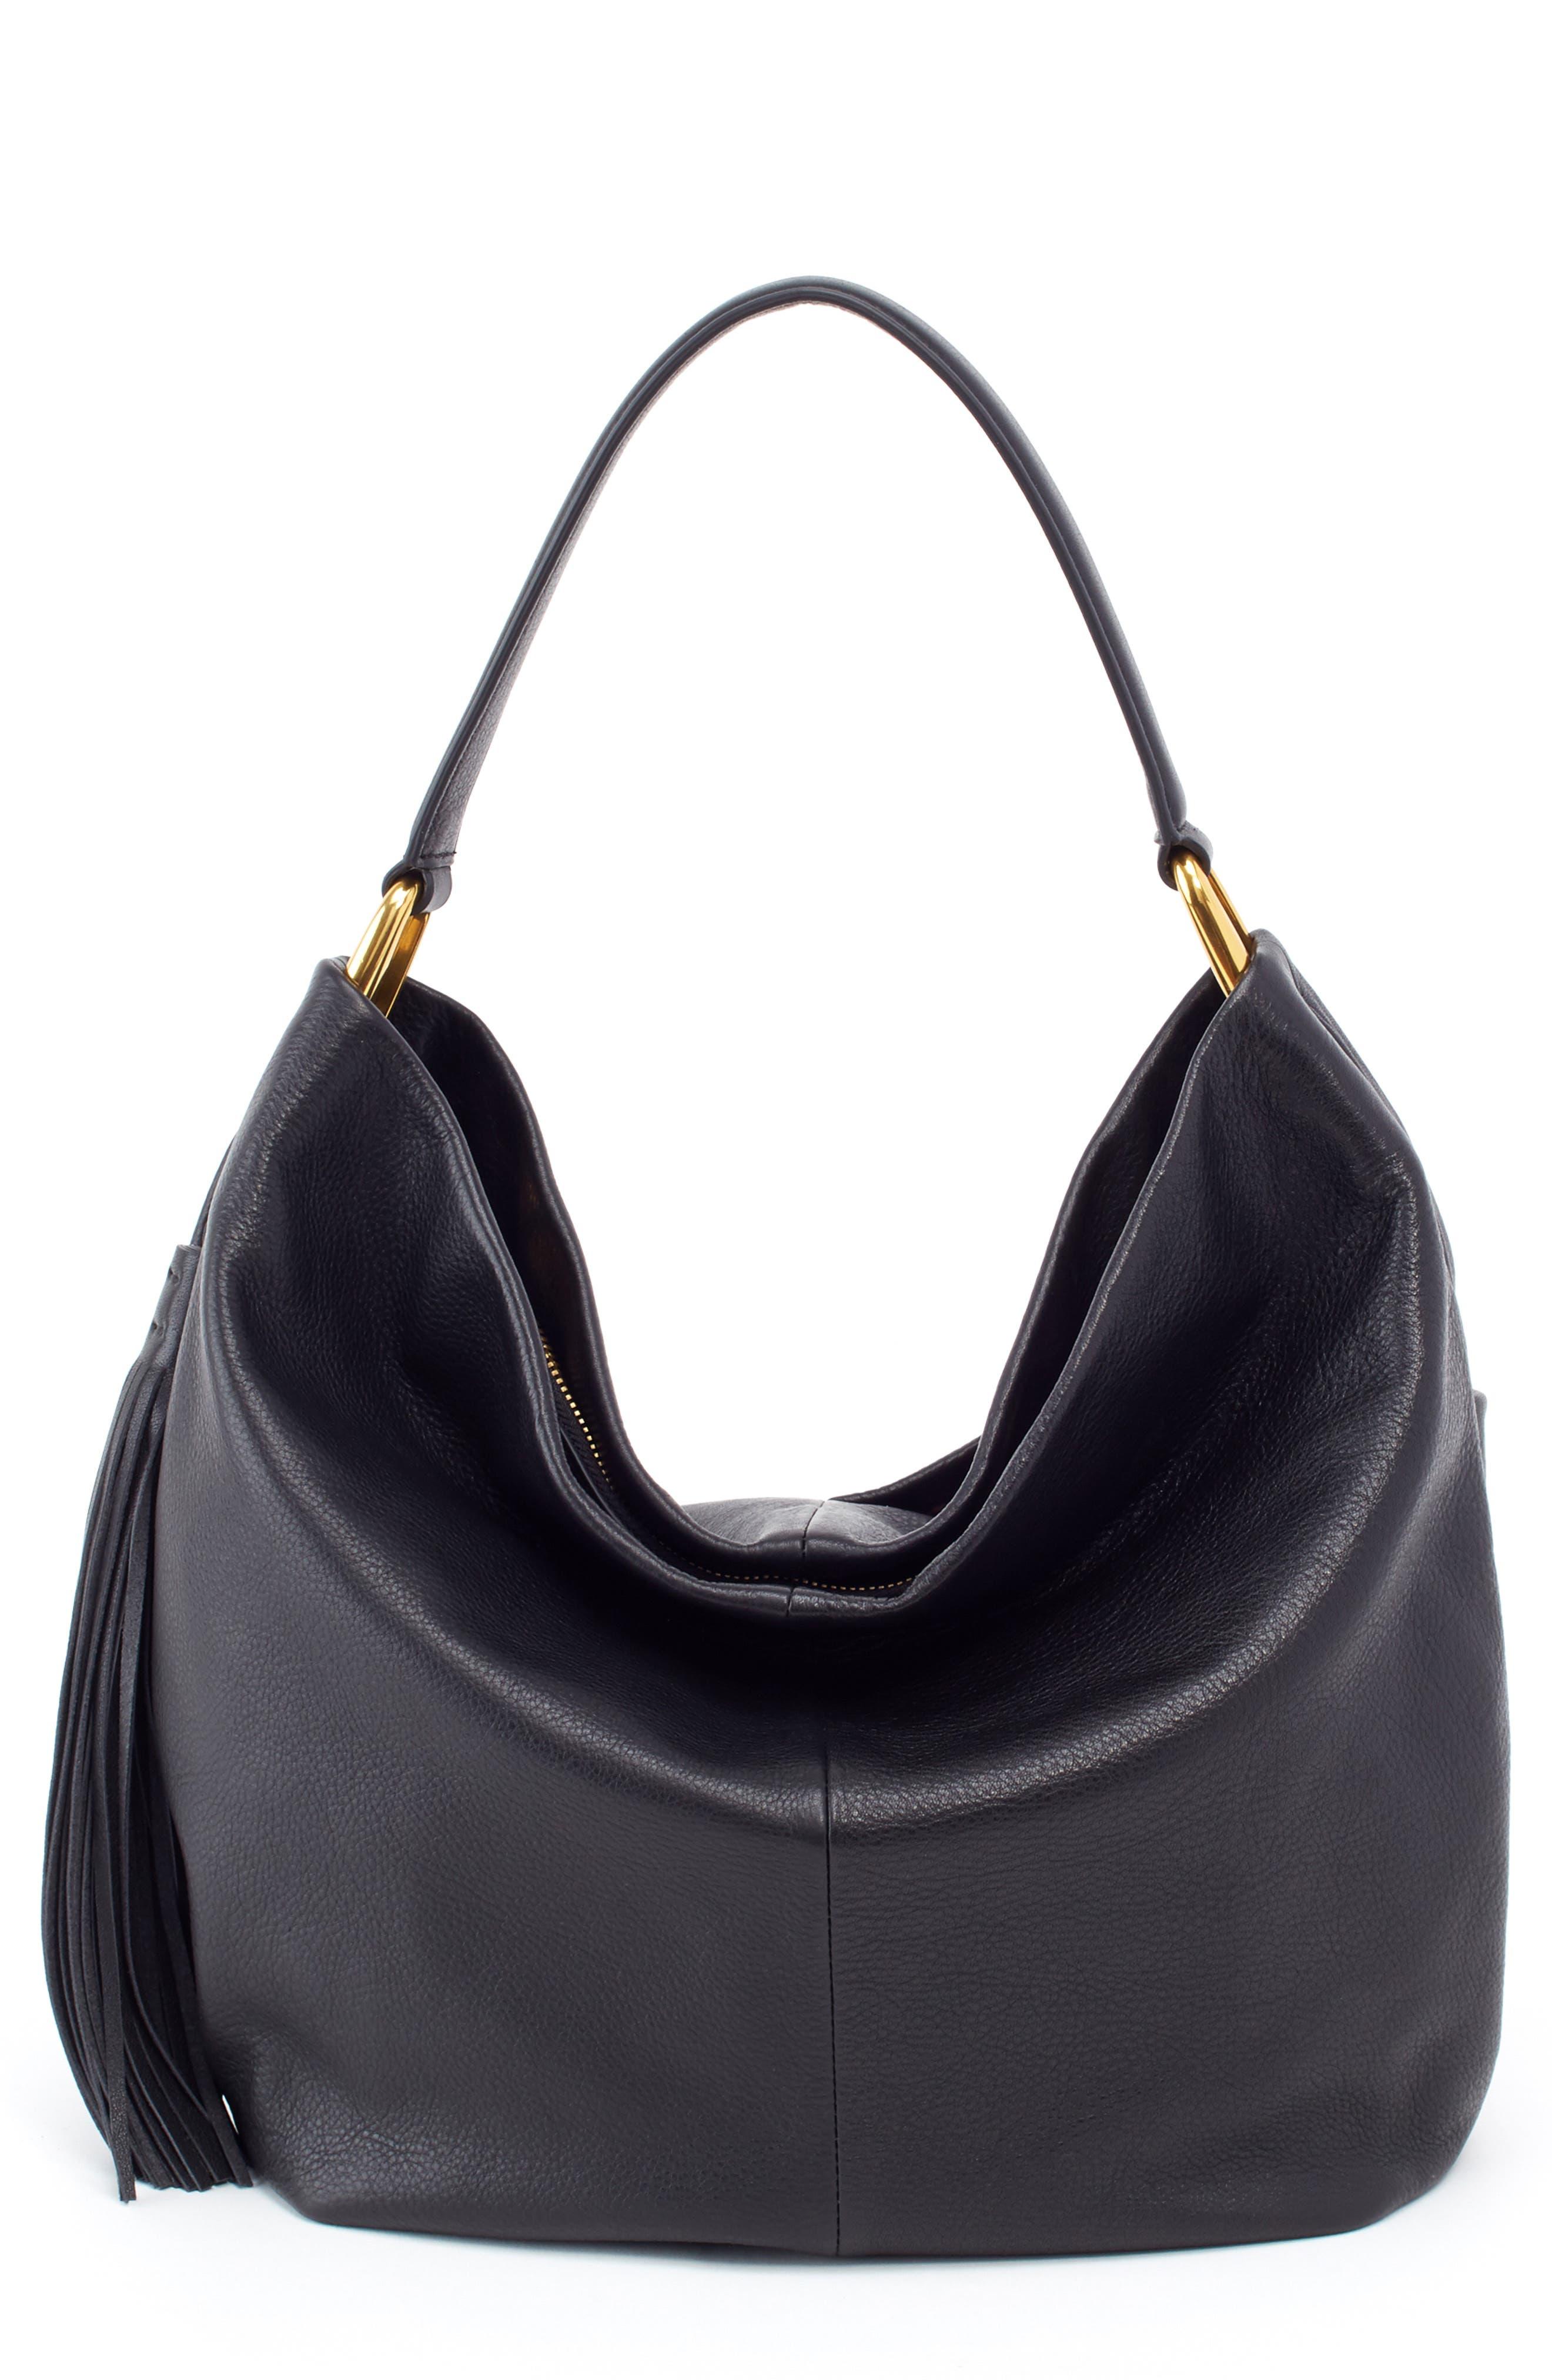 6a8bf9e37b0 Shoulder Bags | Nordstrom